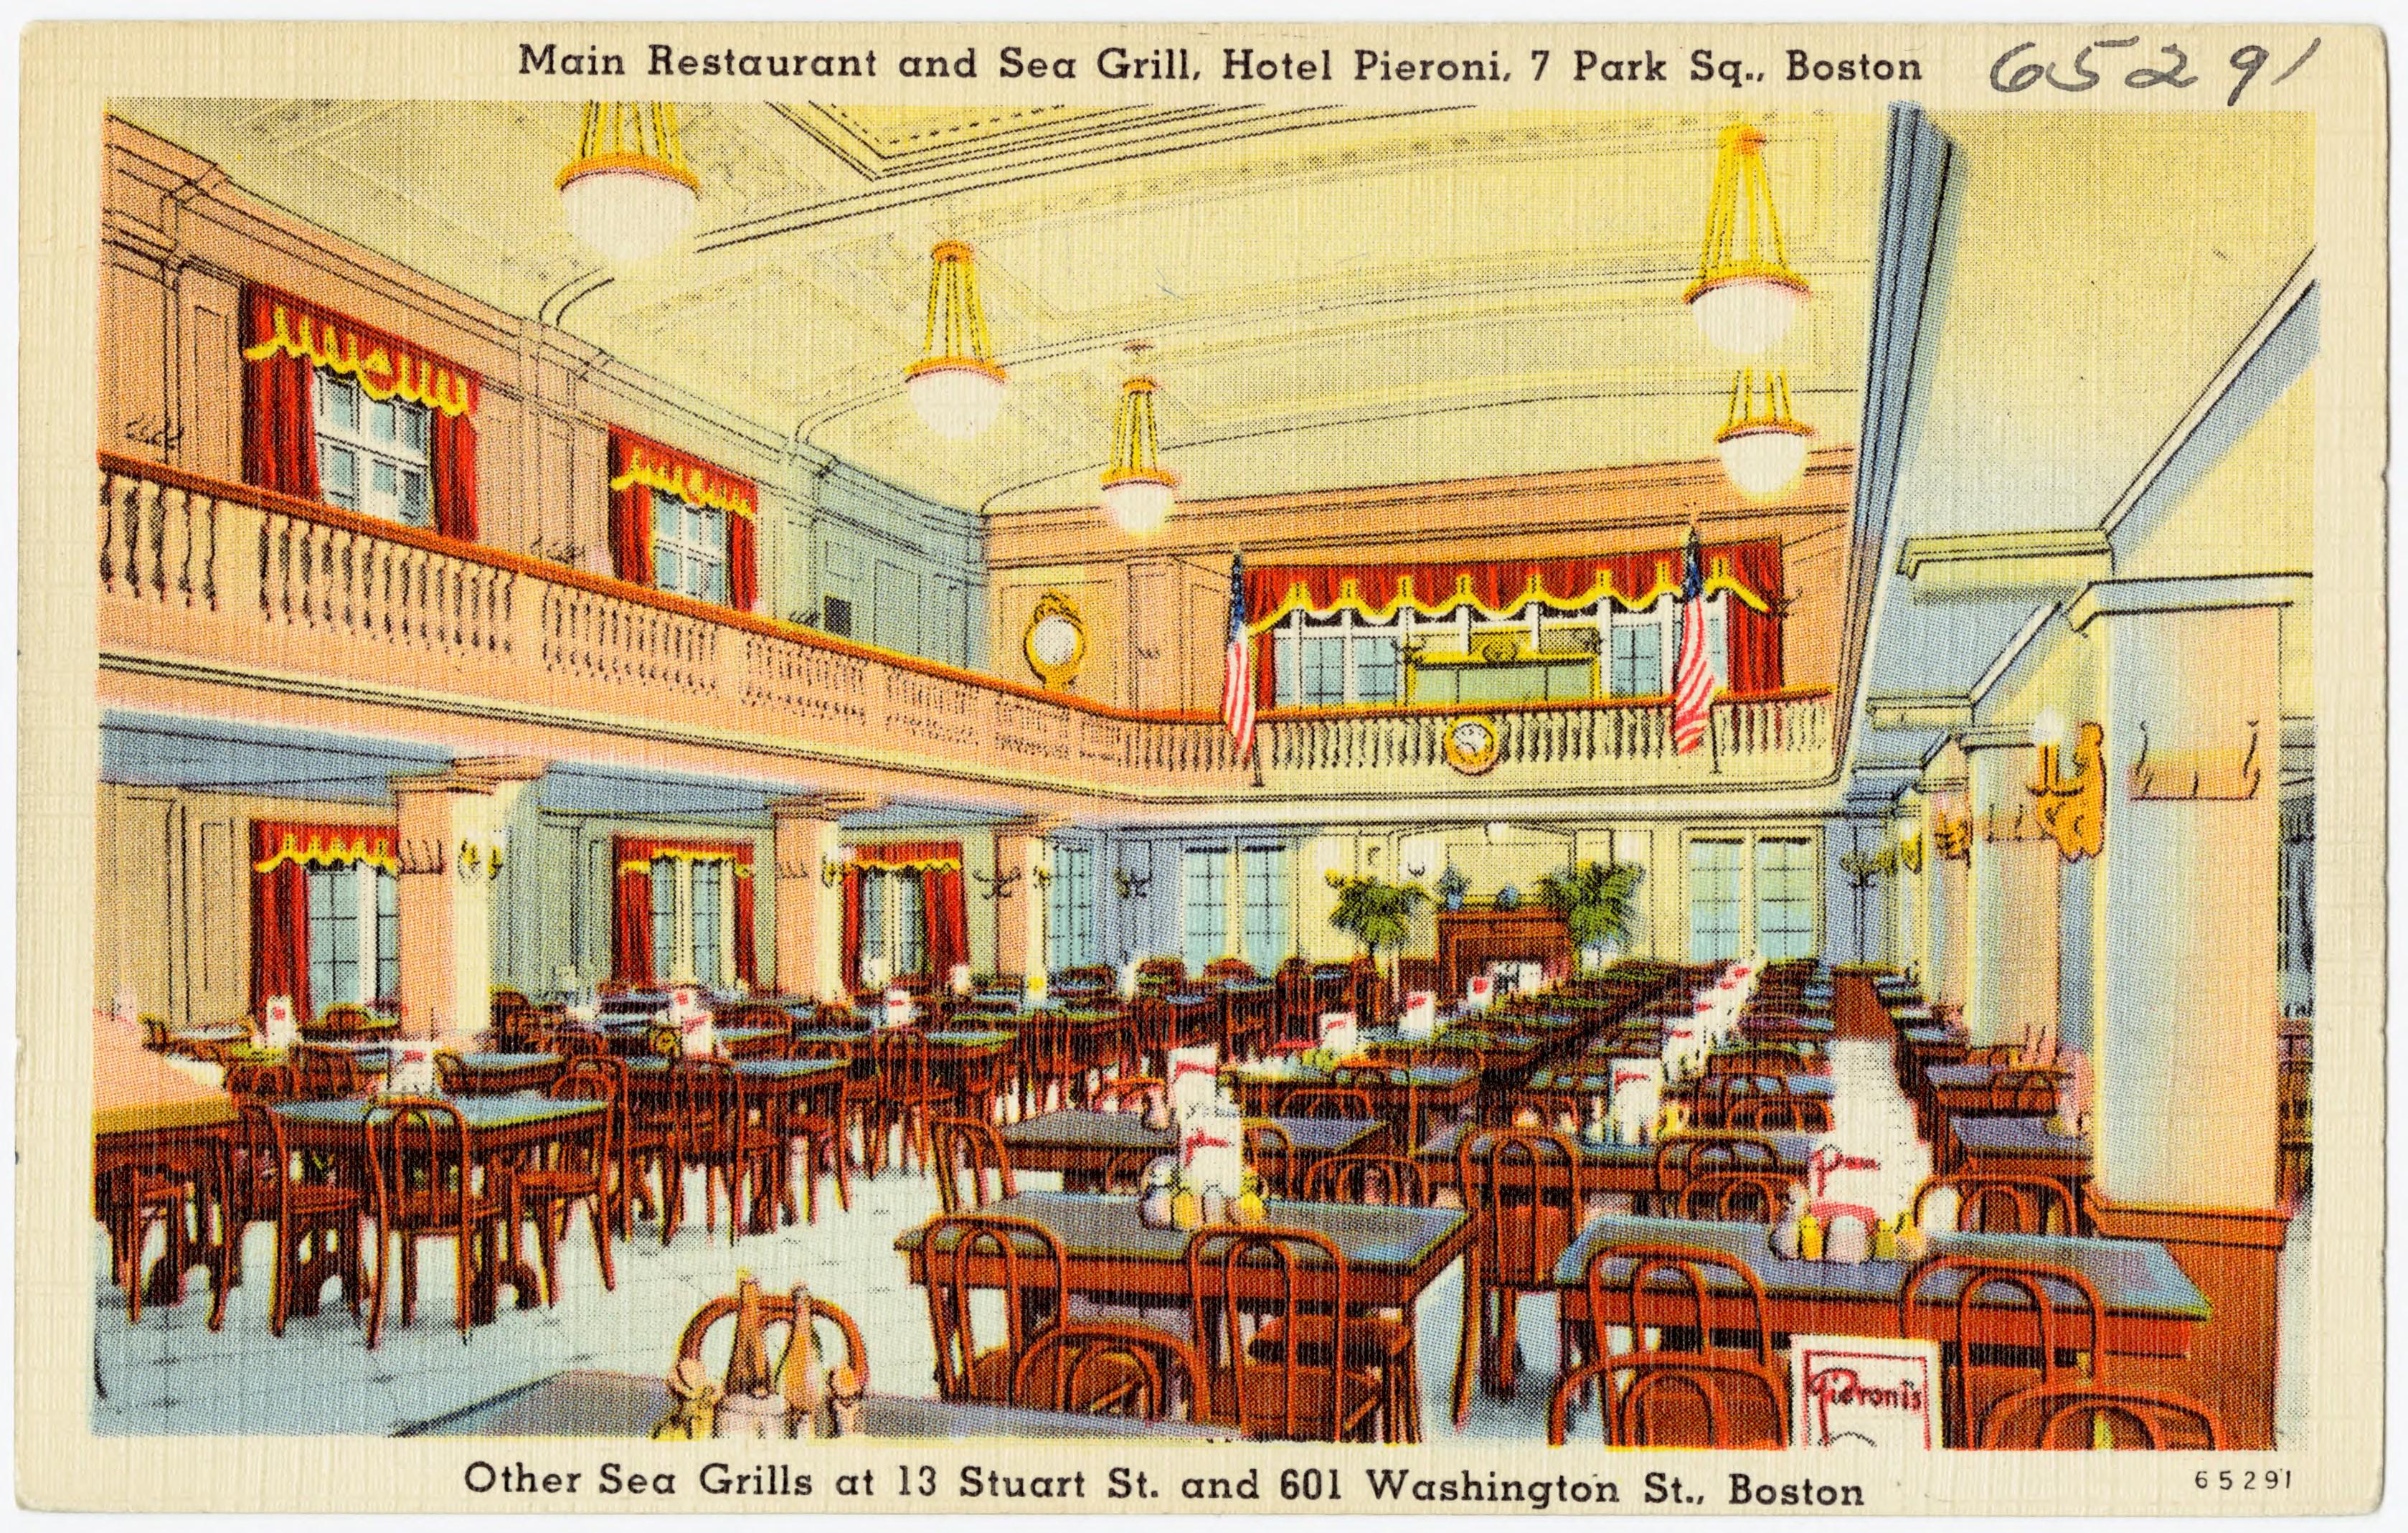 File Main Restaurant And Sea Grill Hotel Pieroni 7 Park Sq Boston Other Sea Grills At 13 Stuart St And 601 Washington St Boston 65291 Jpg Wikimedia Commons